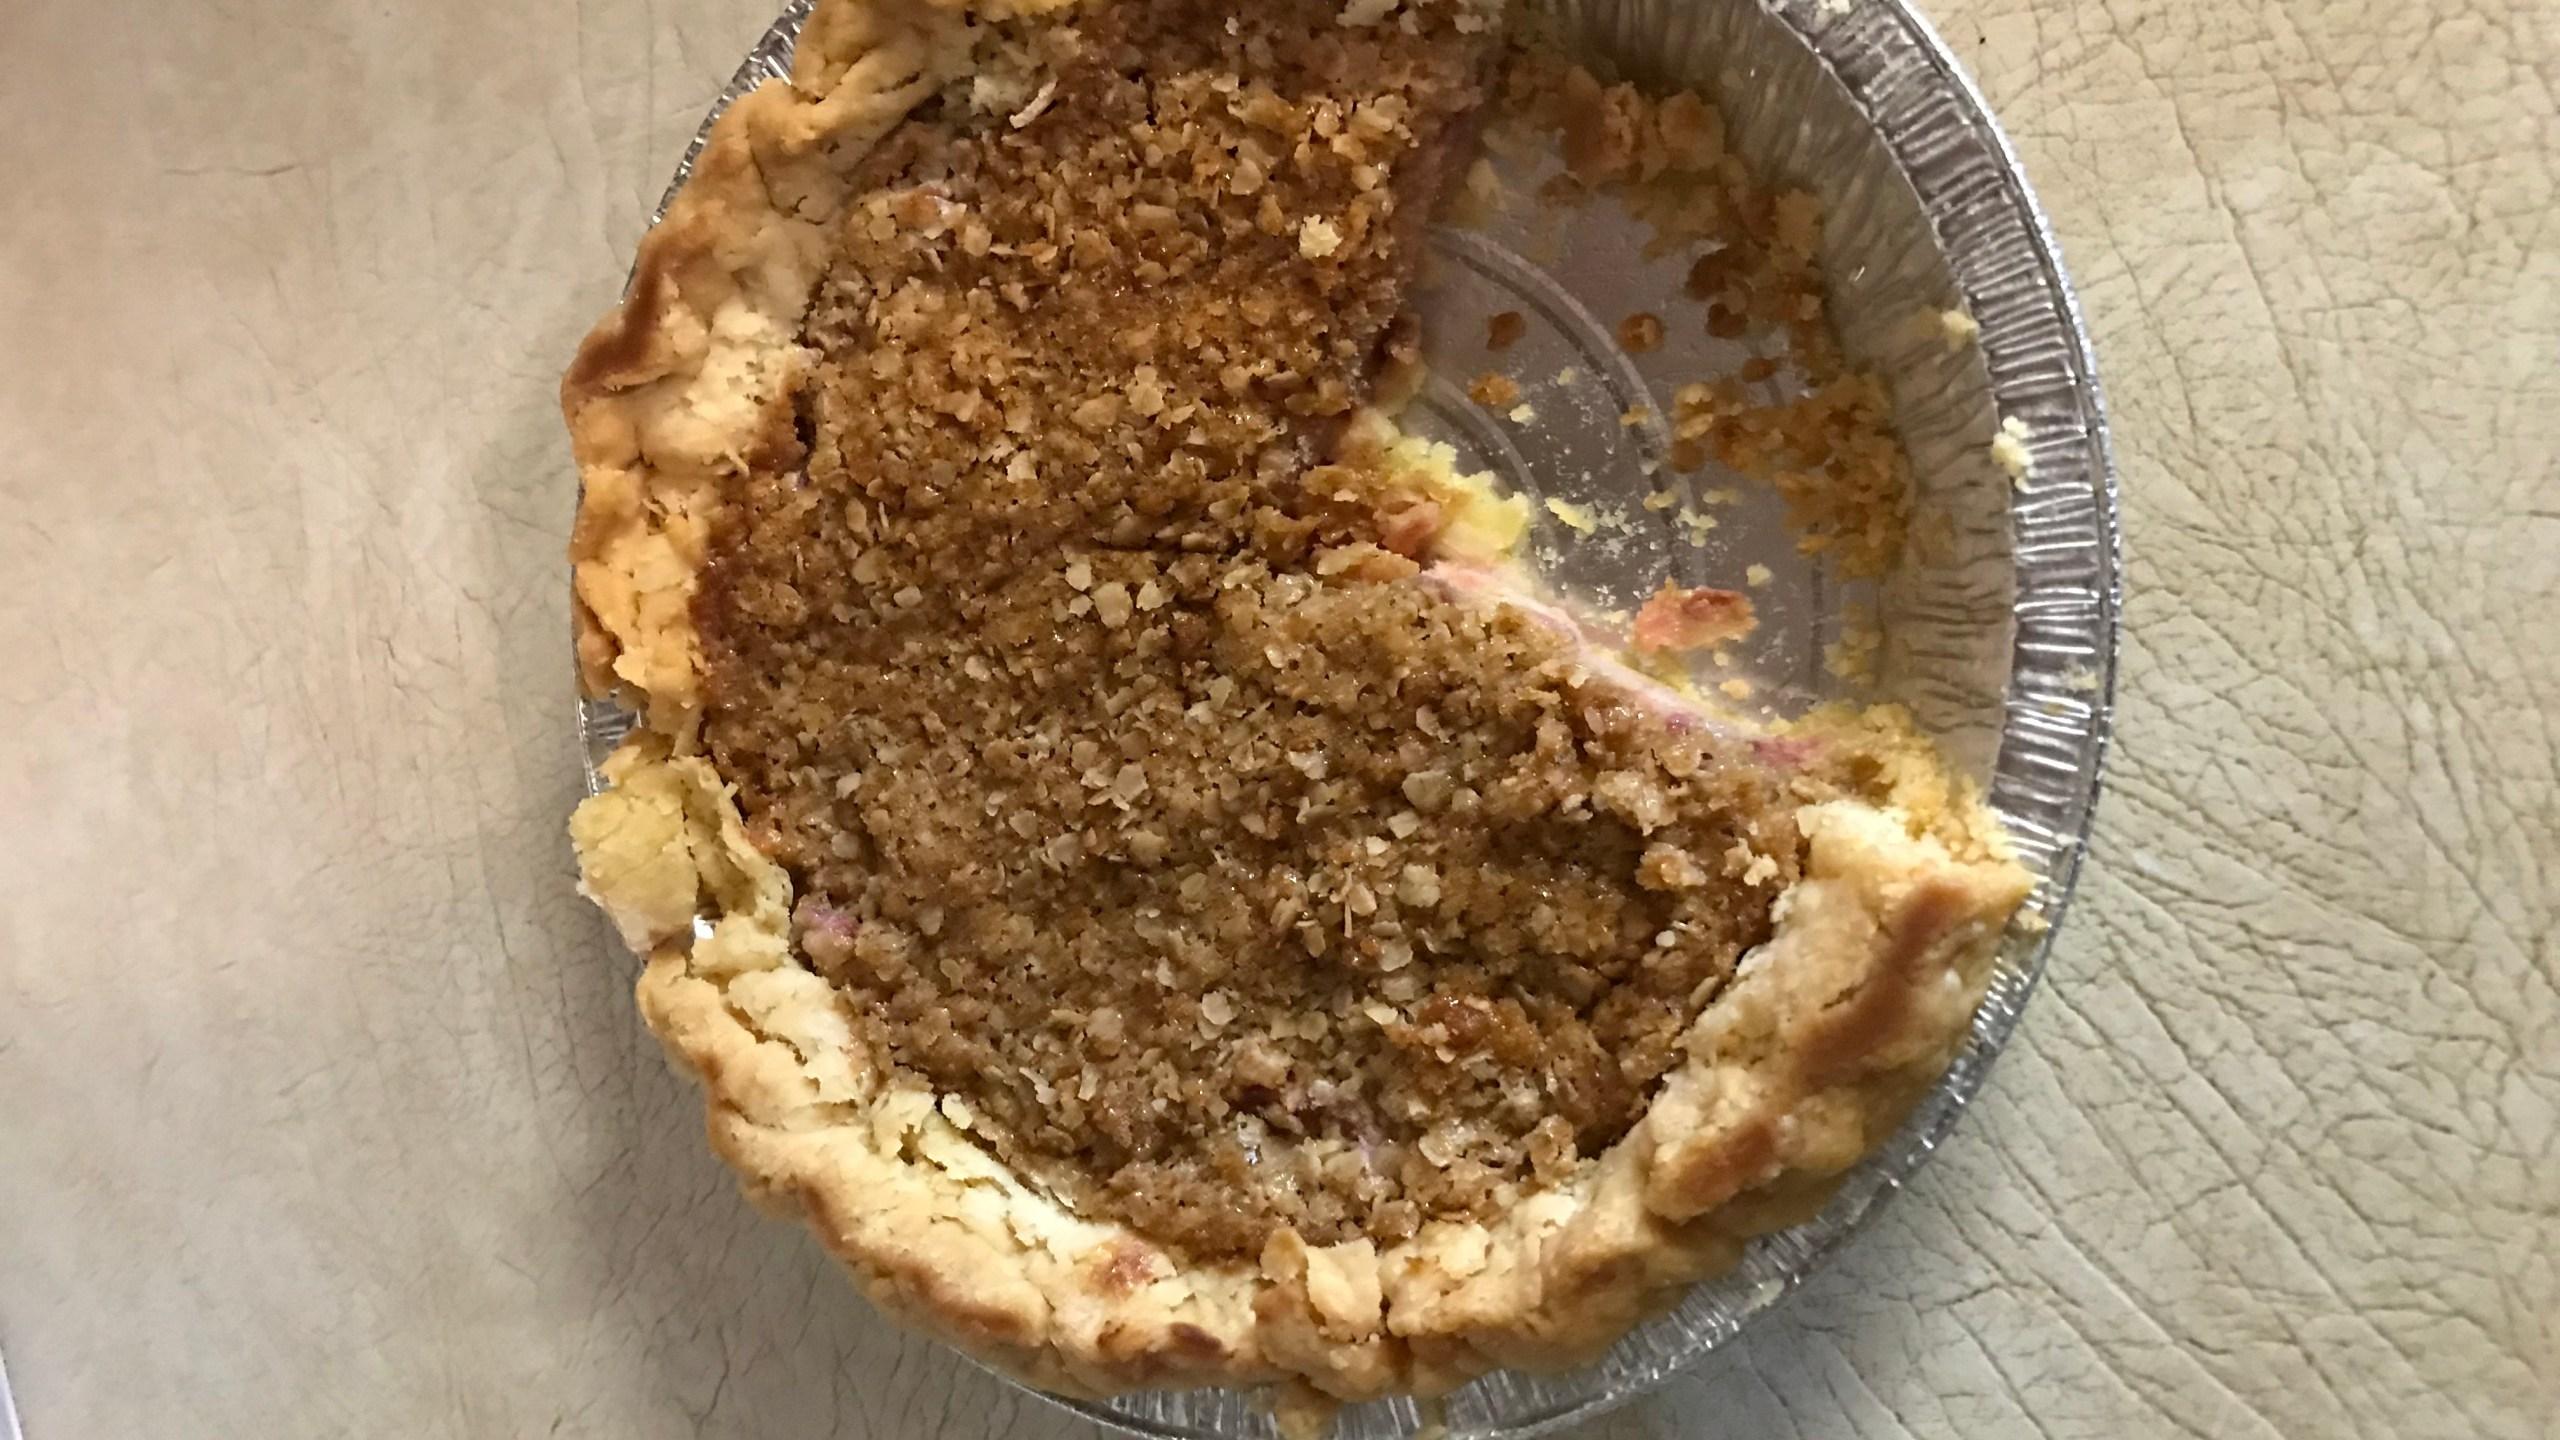 Allen County Fair champion rhubarb pie